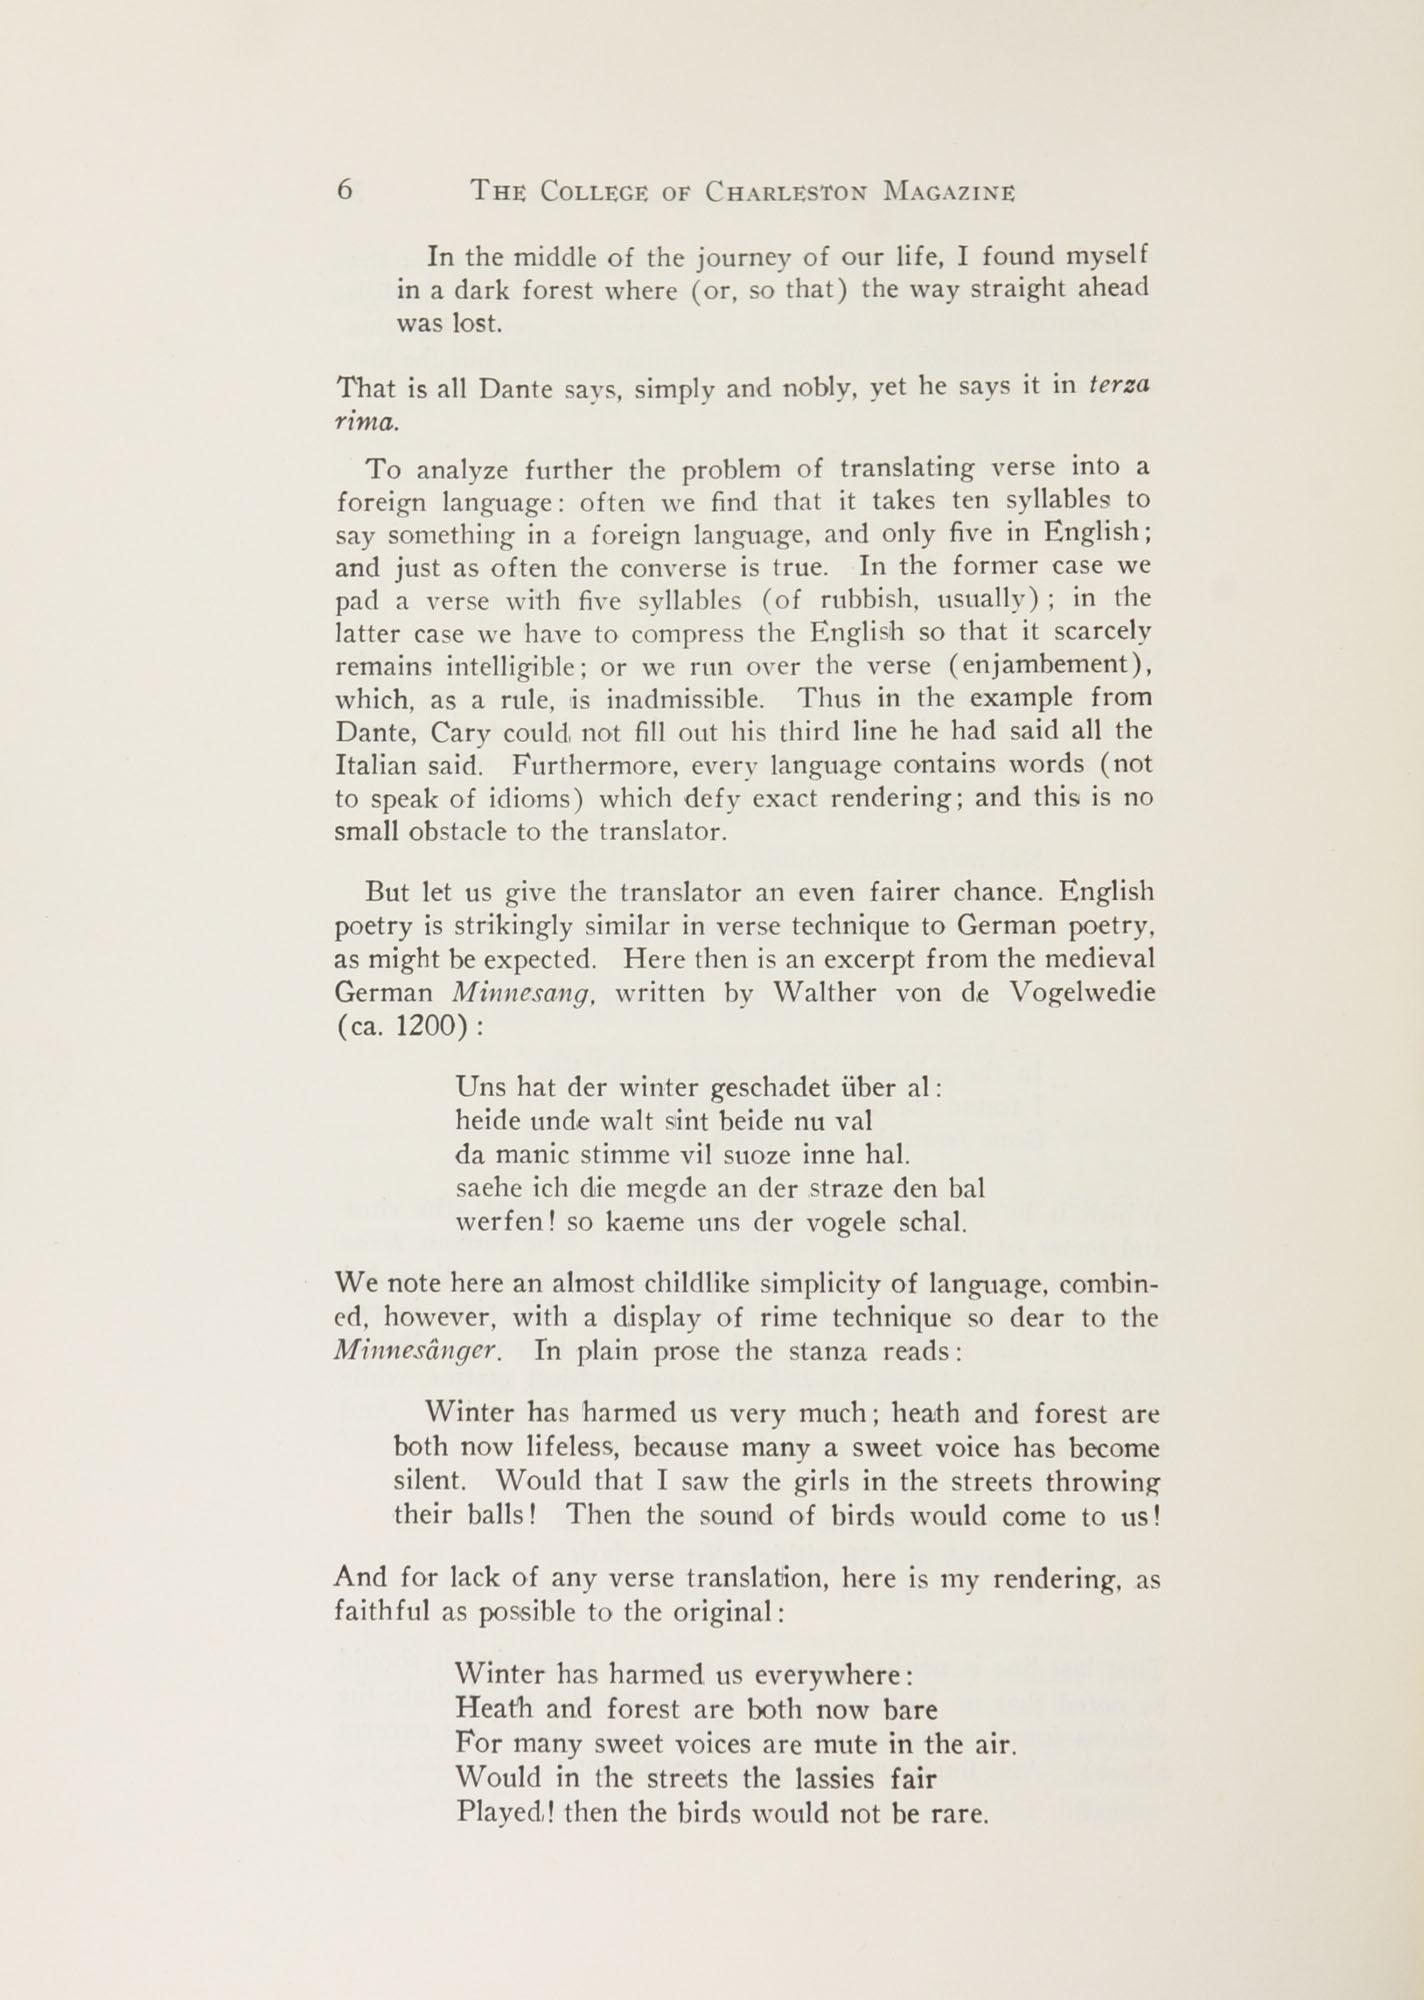 College of Charleston Magazine, 1941-1942, Vol. 45 No. 1, page 6